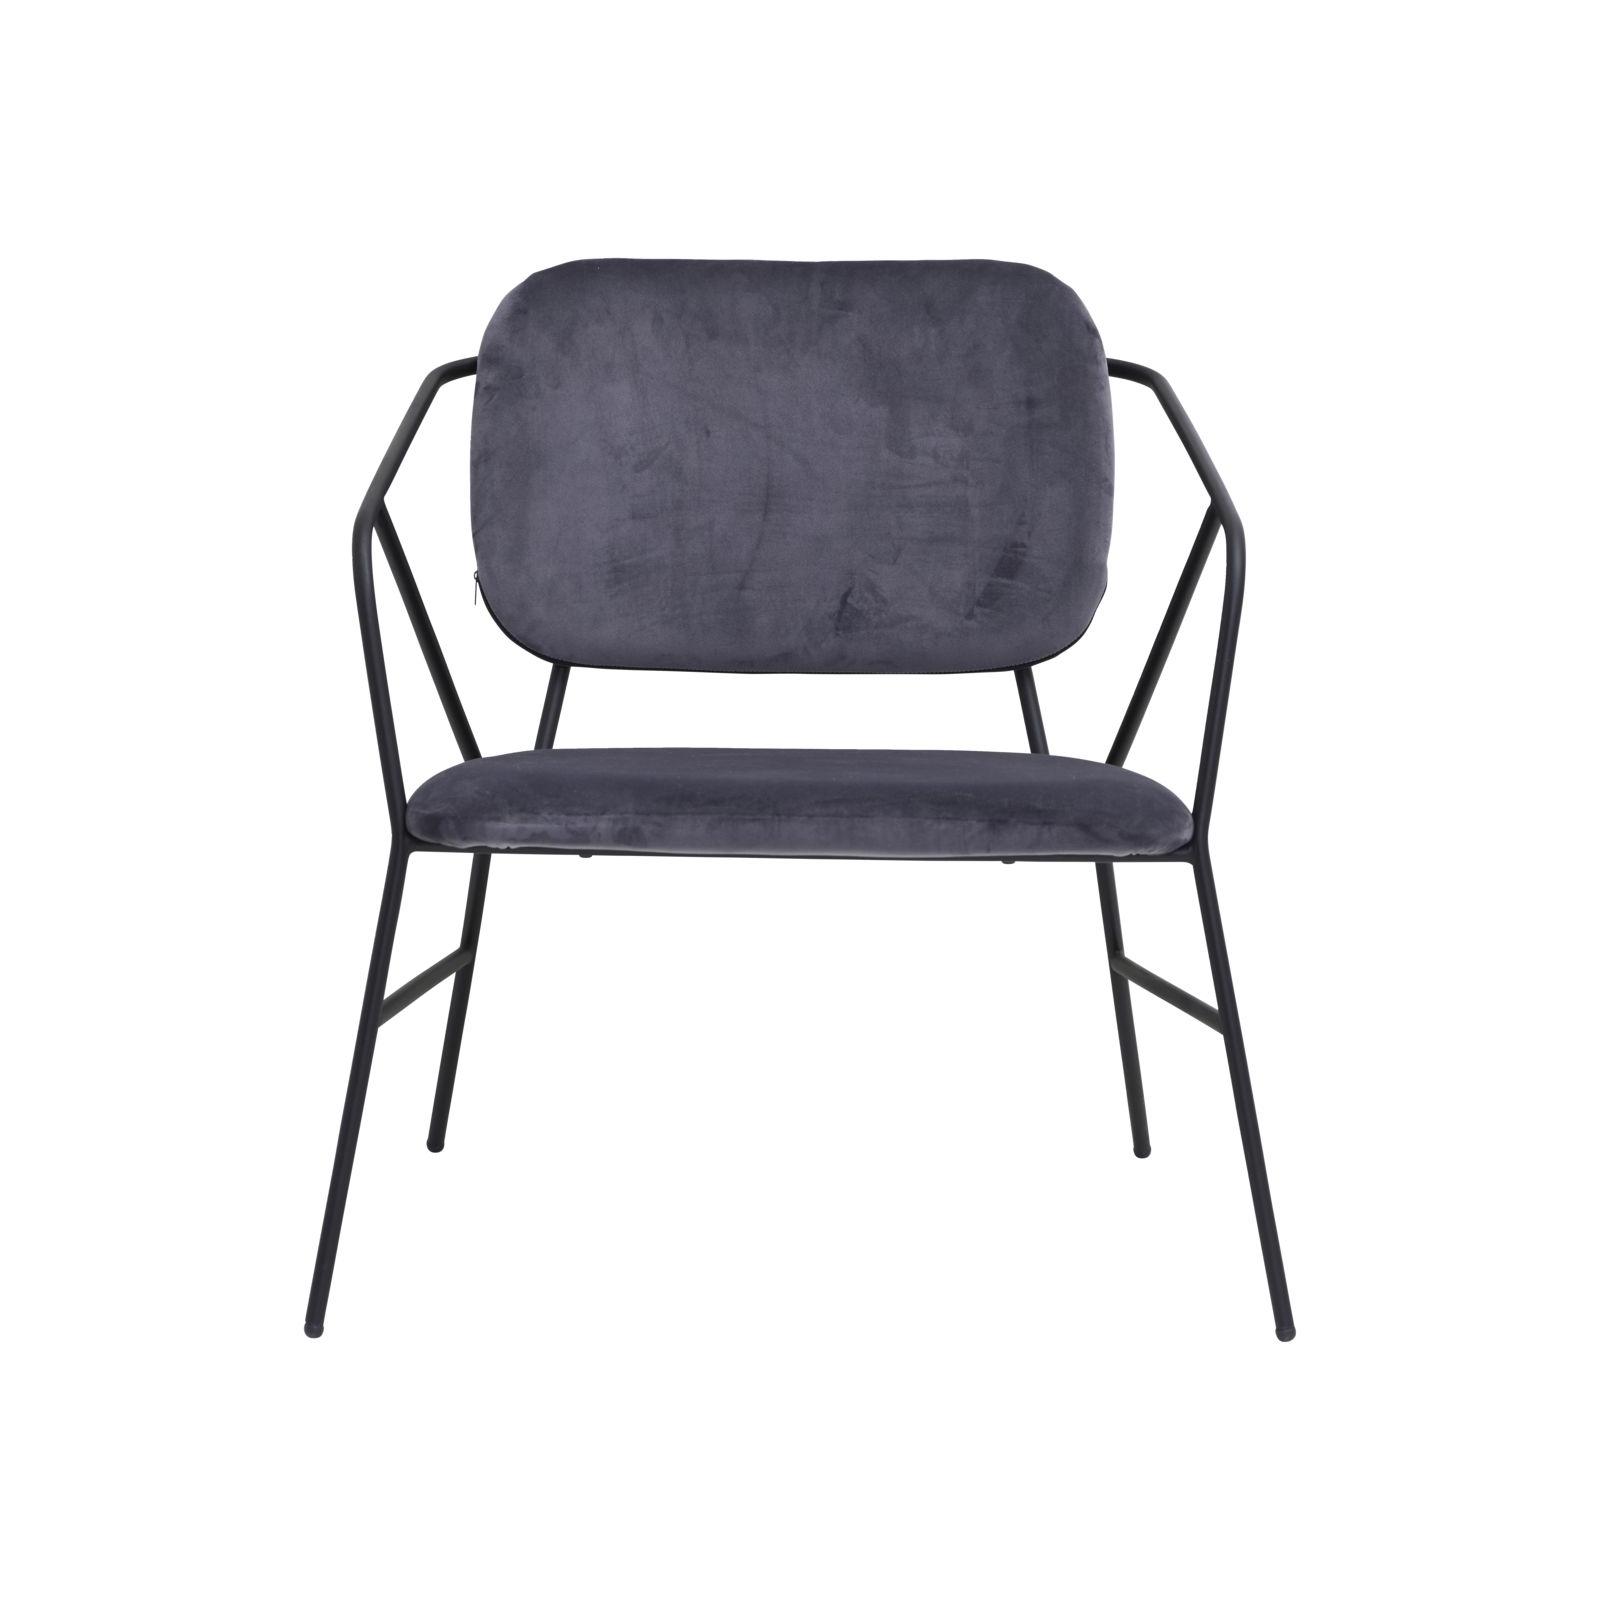 Lounge stol KLEVER grå, House Doctor